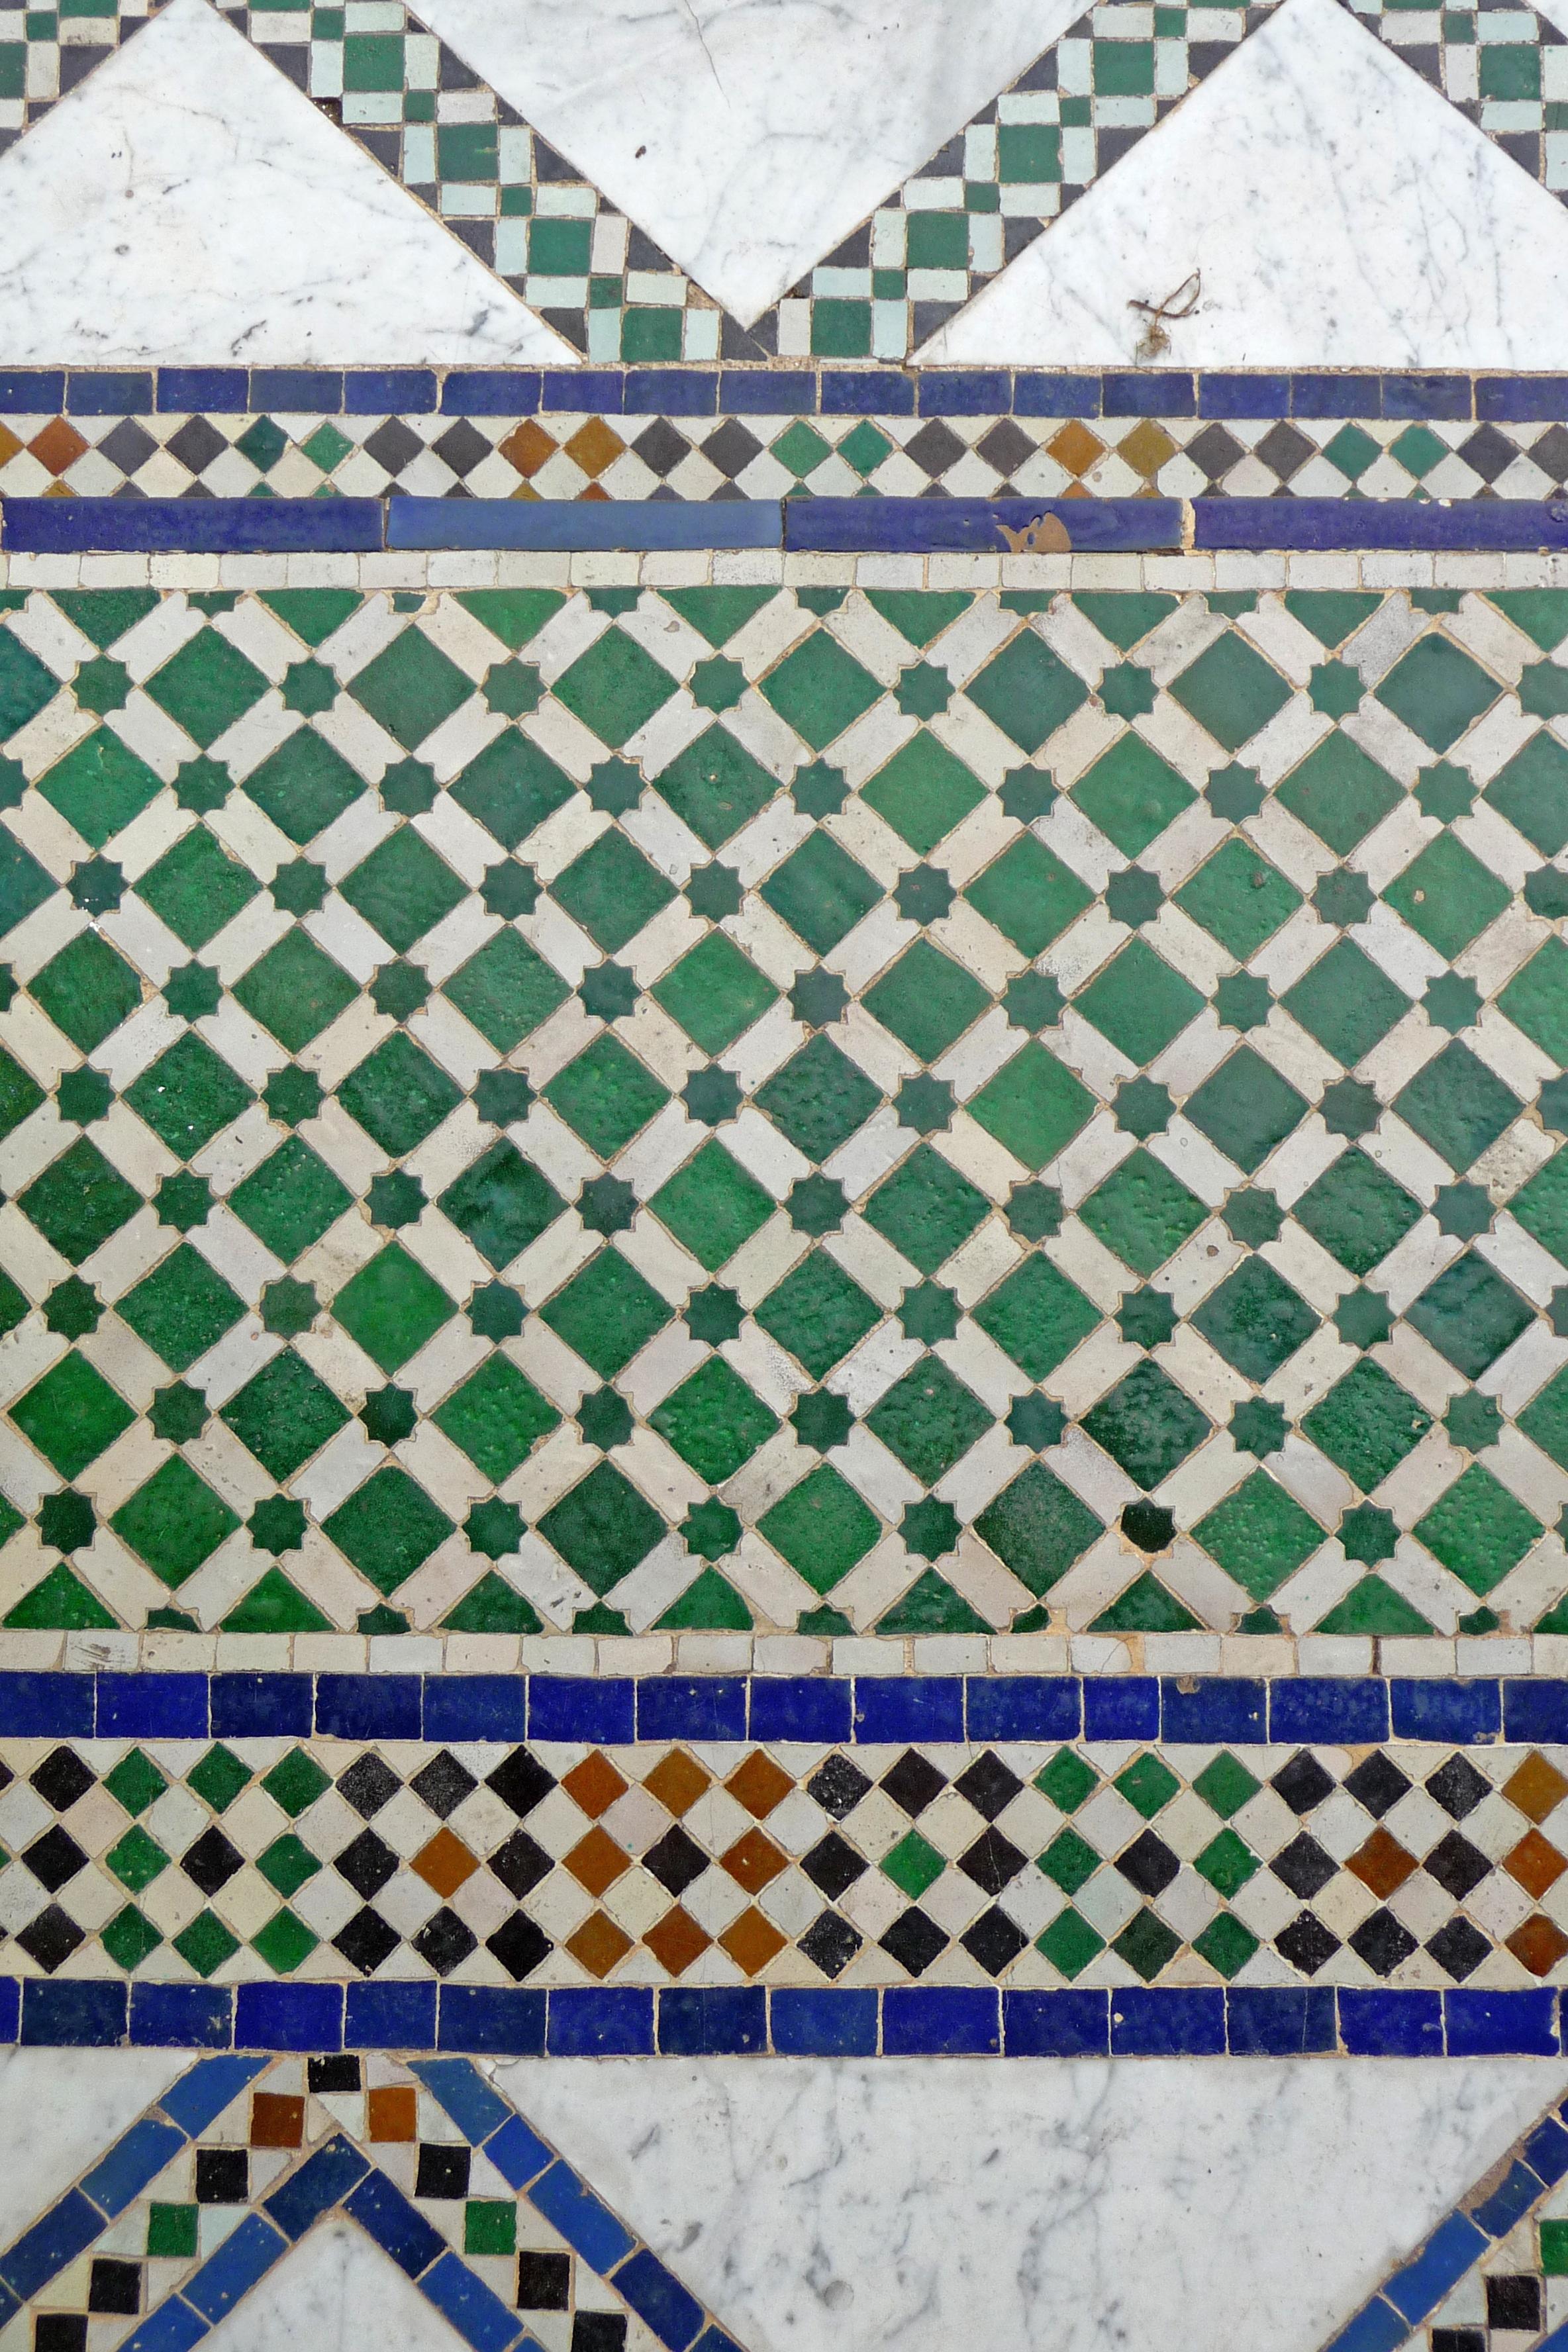 Tourism Material Quilt Patchwork Textile Art Palais Design Symmetry Tiles Marrakech Morocco Bahia Moroccan Arabic Flooring Marrakesh